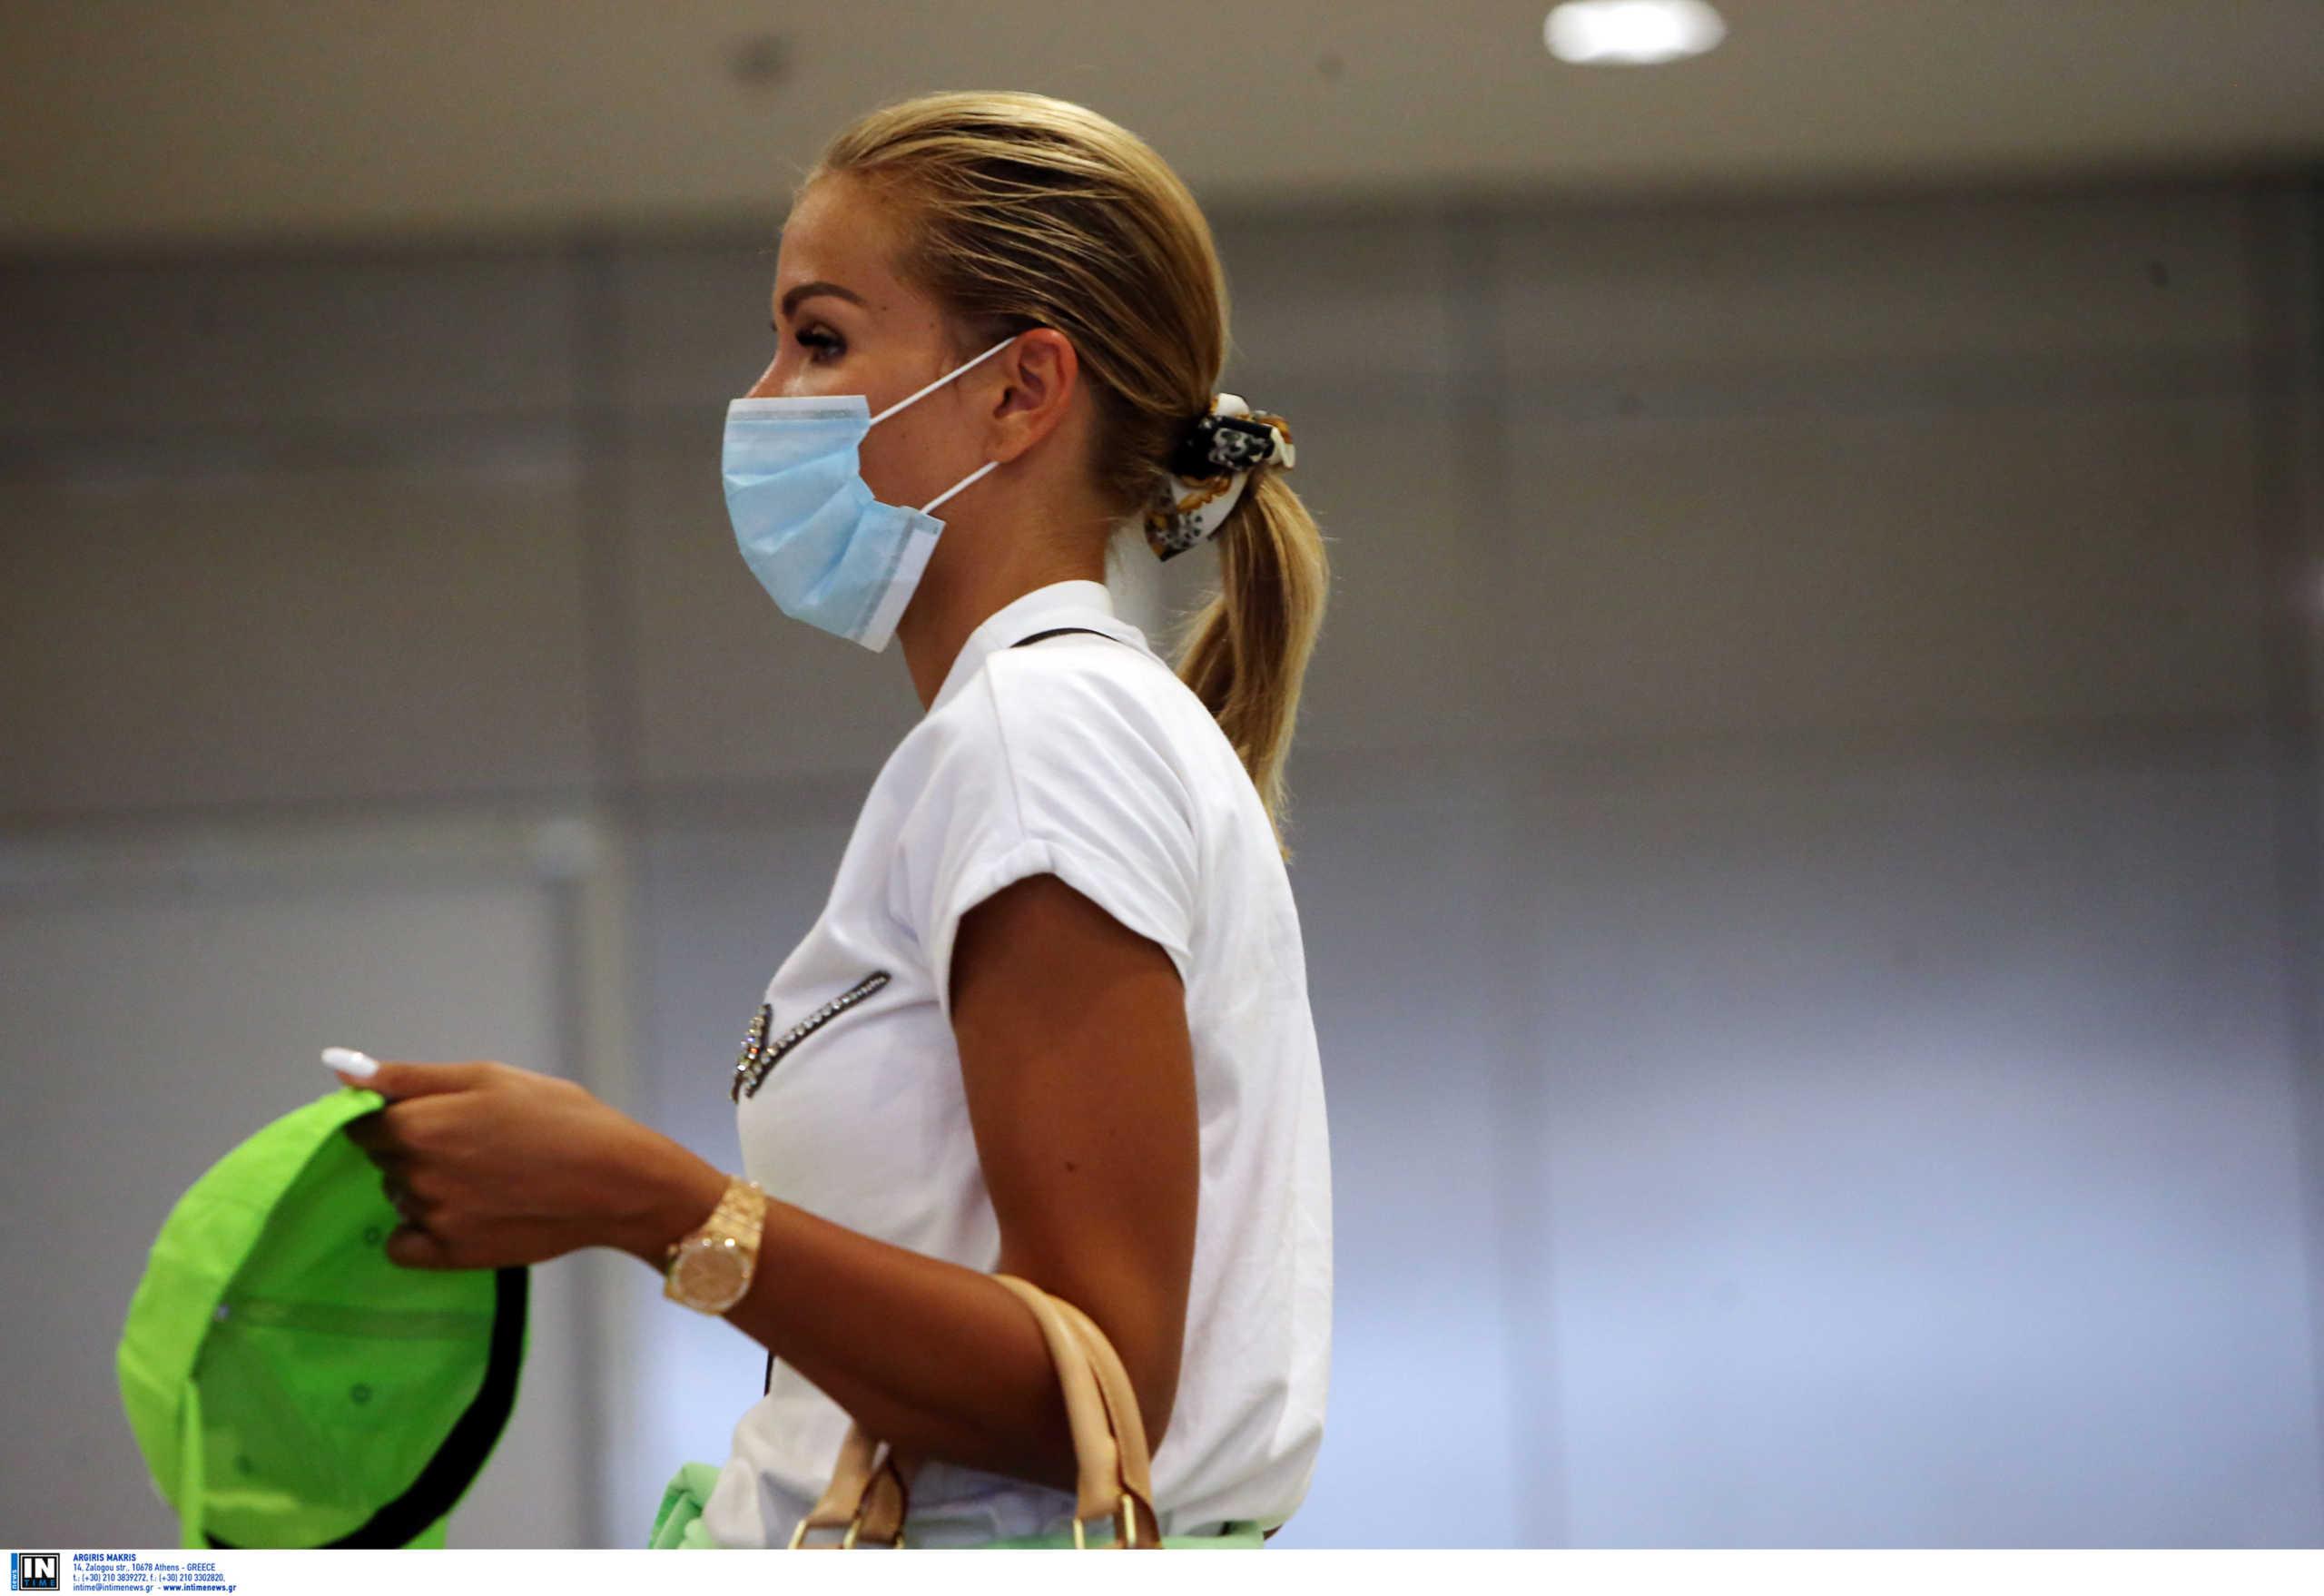 Wu Lien-teh: 3 πράγματα που δεν γνωρίζετε για τον γιατρό που εφηύρε τη μάσκα N-95